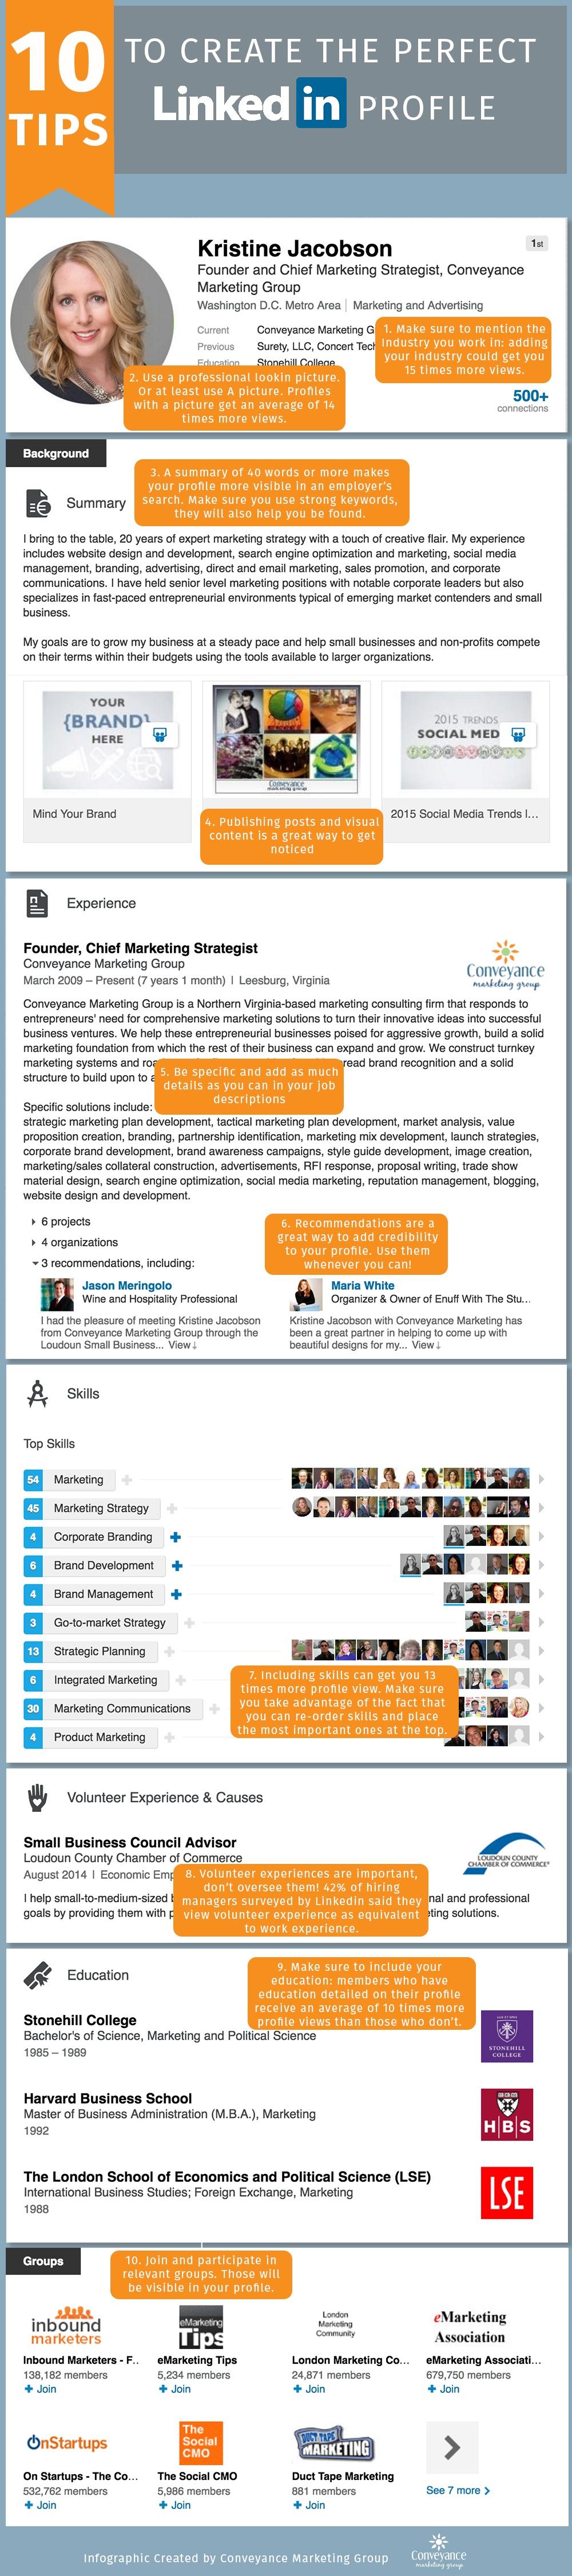 10 Tips to Create the Perfect LinkedIn Profile, Marketing Strategy, Social Media